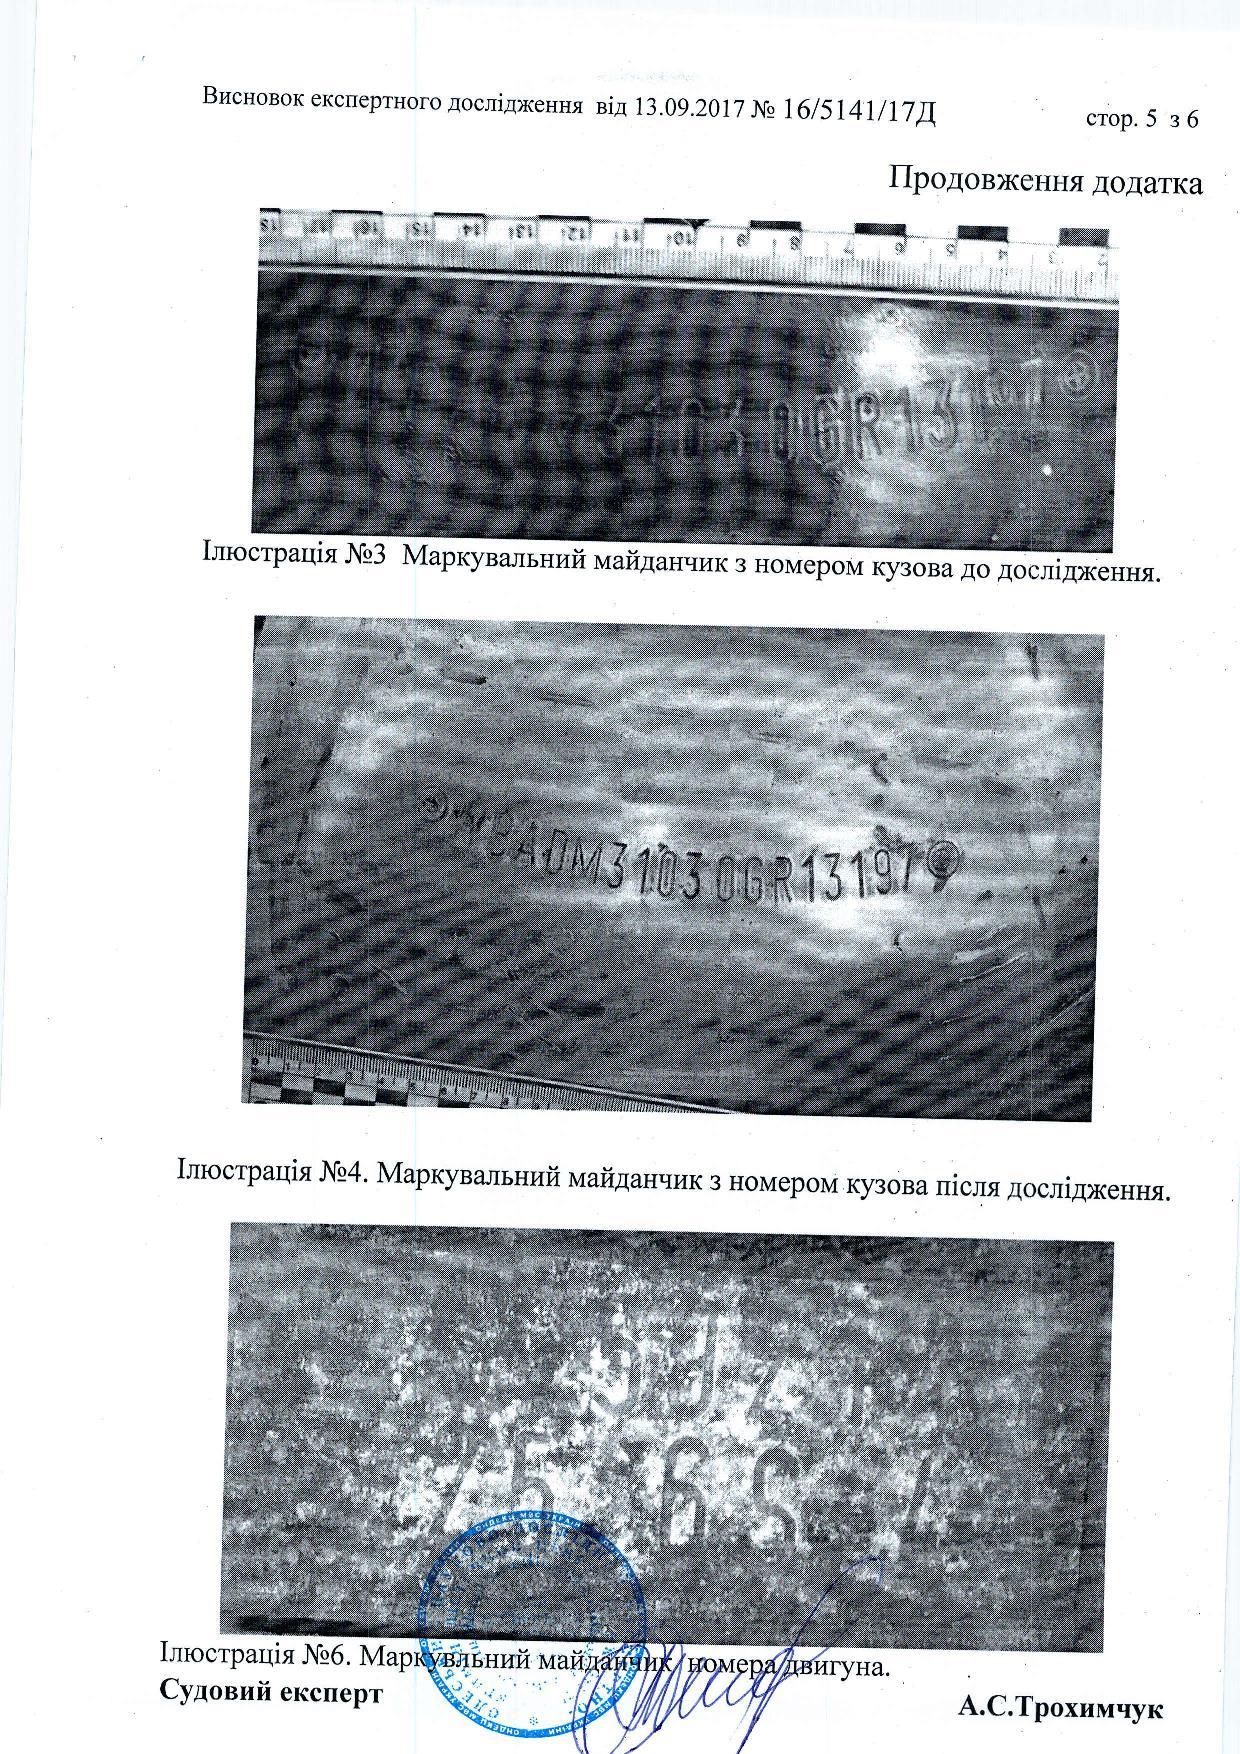 image http://forum.setam.net.ua/assets/images/79-lccFC9dmMovdK1jg.jpeg